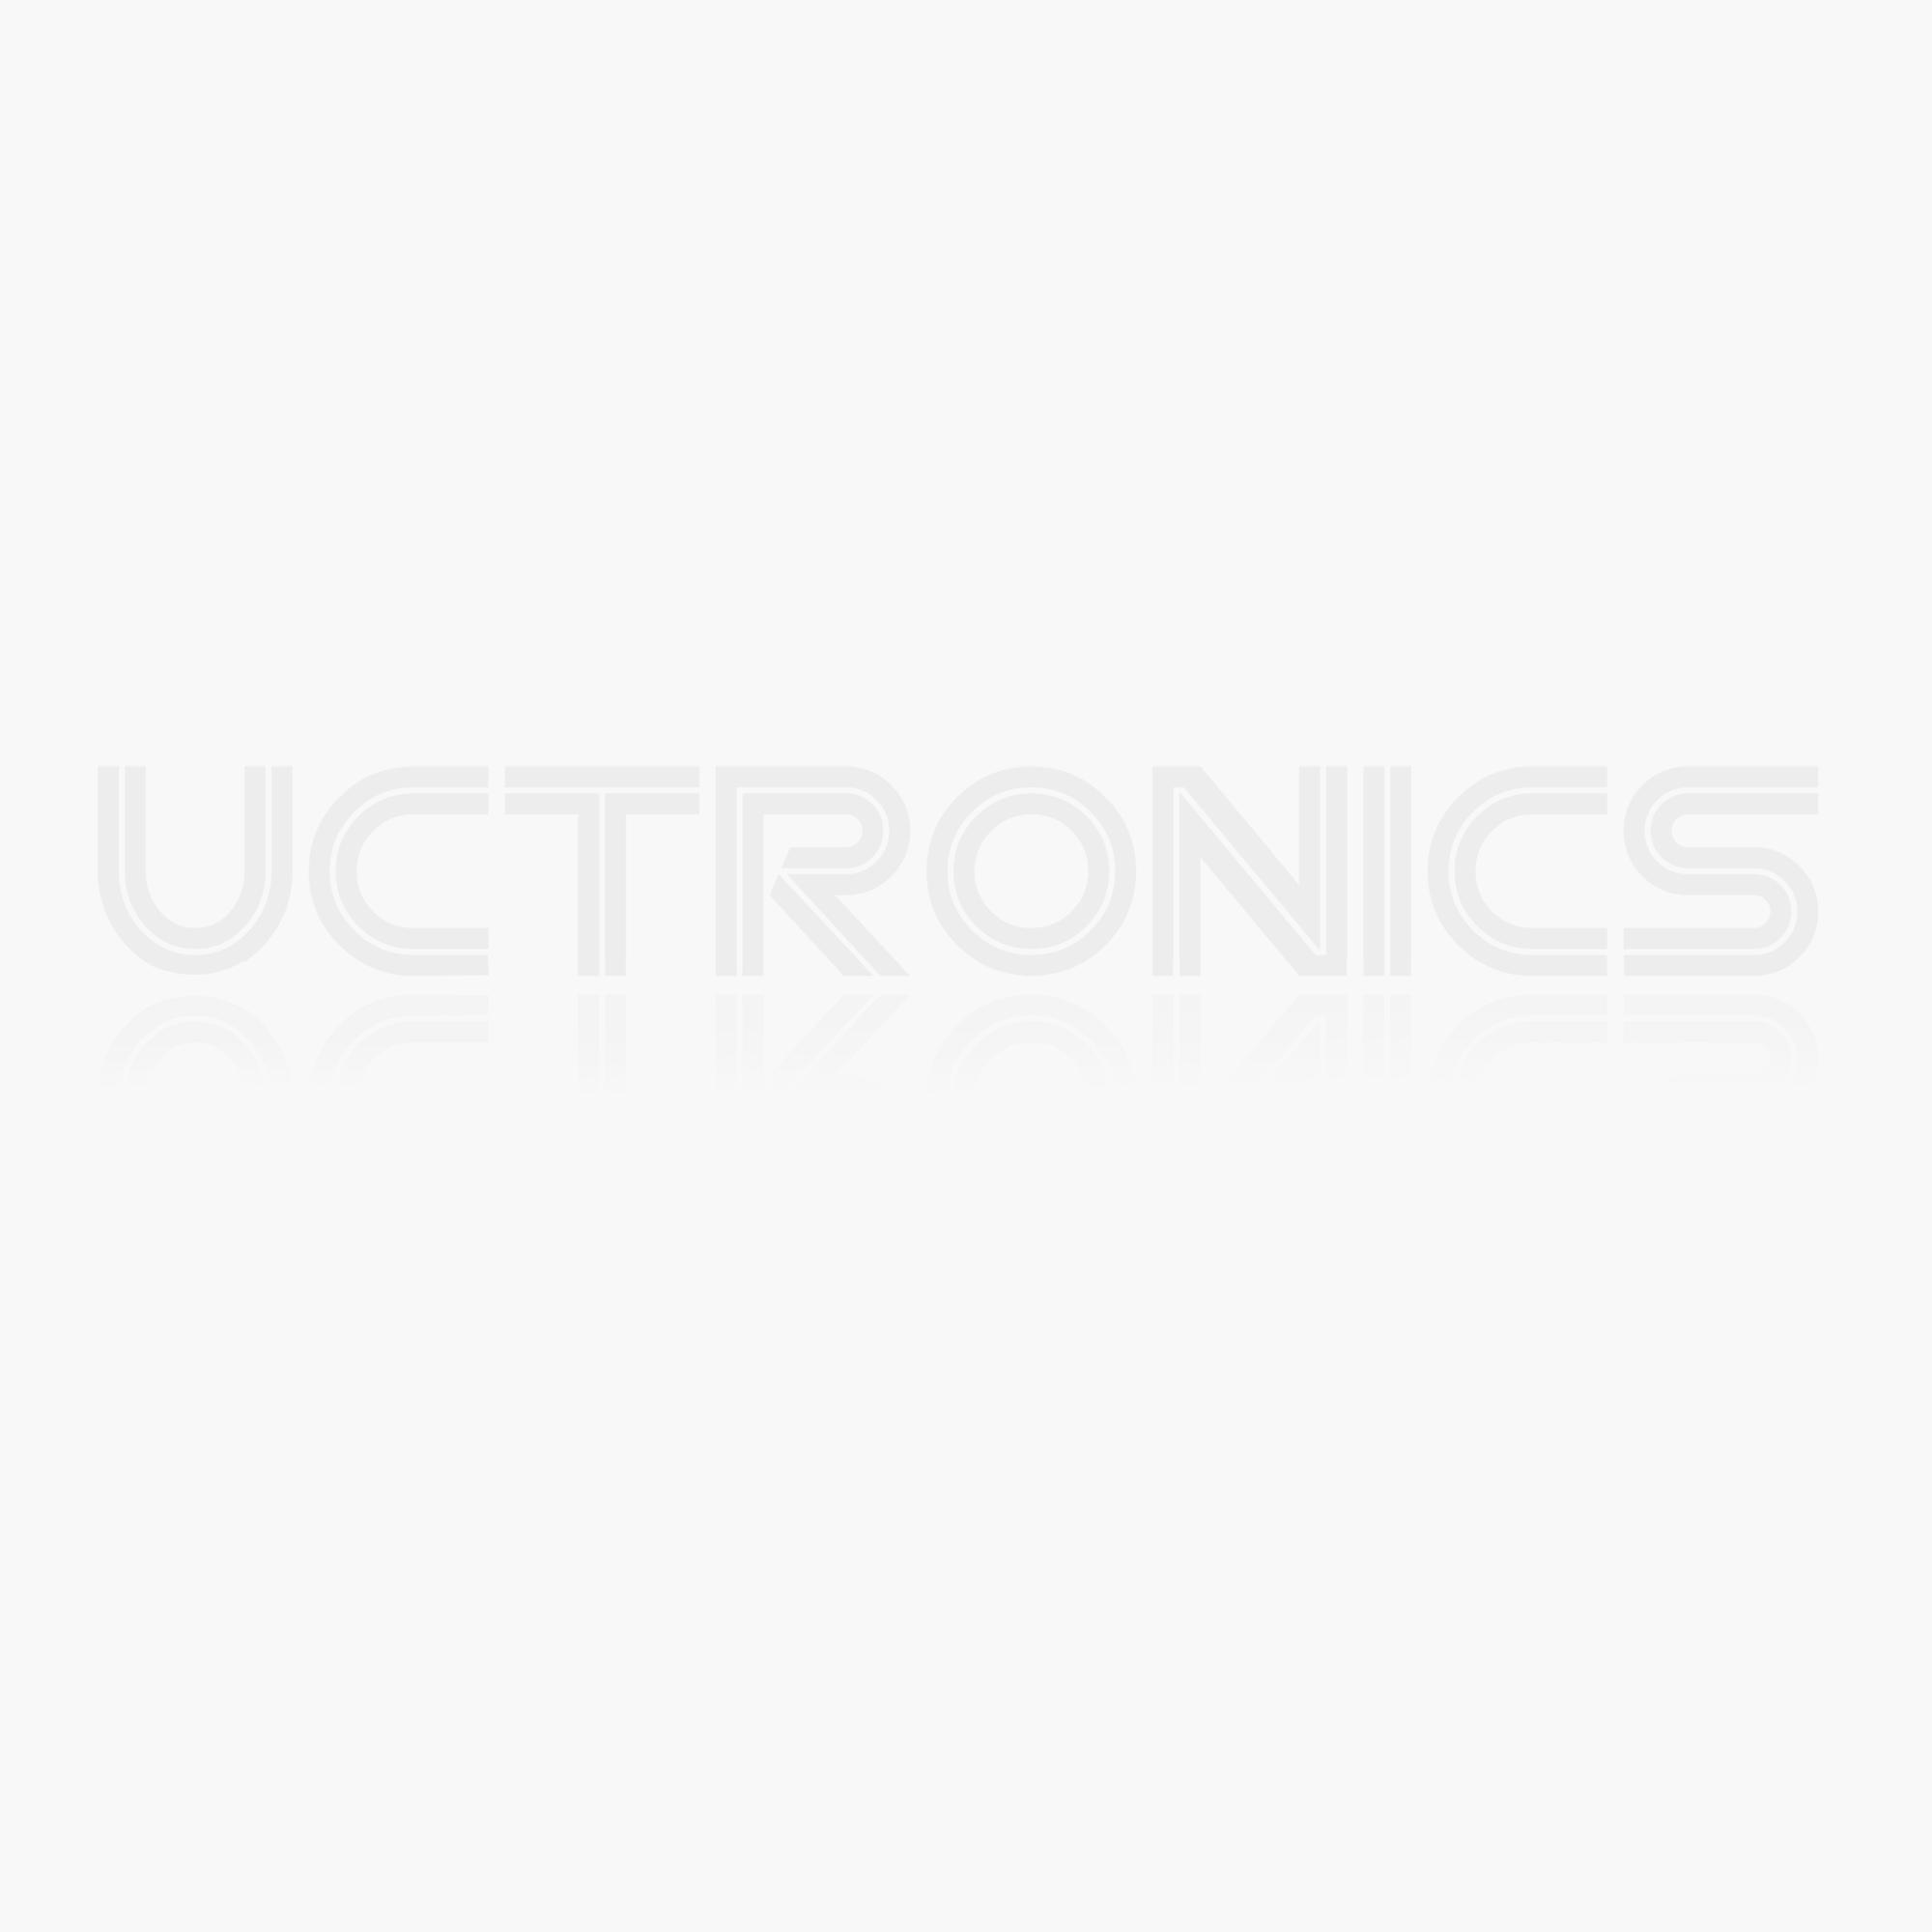 GY_712 ACS712ELCTR-05B 5A current sensor module